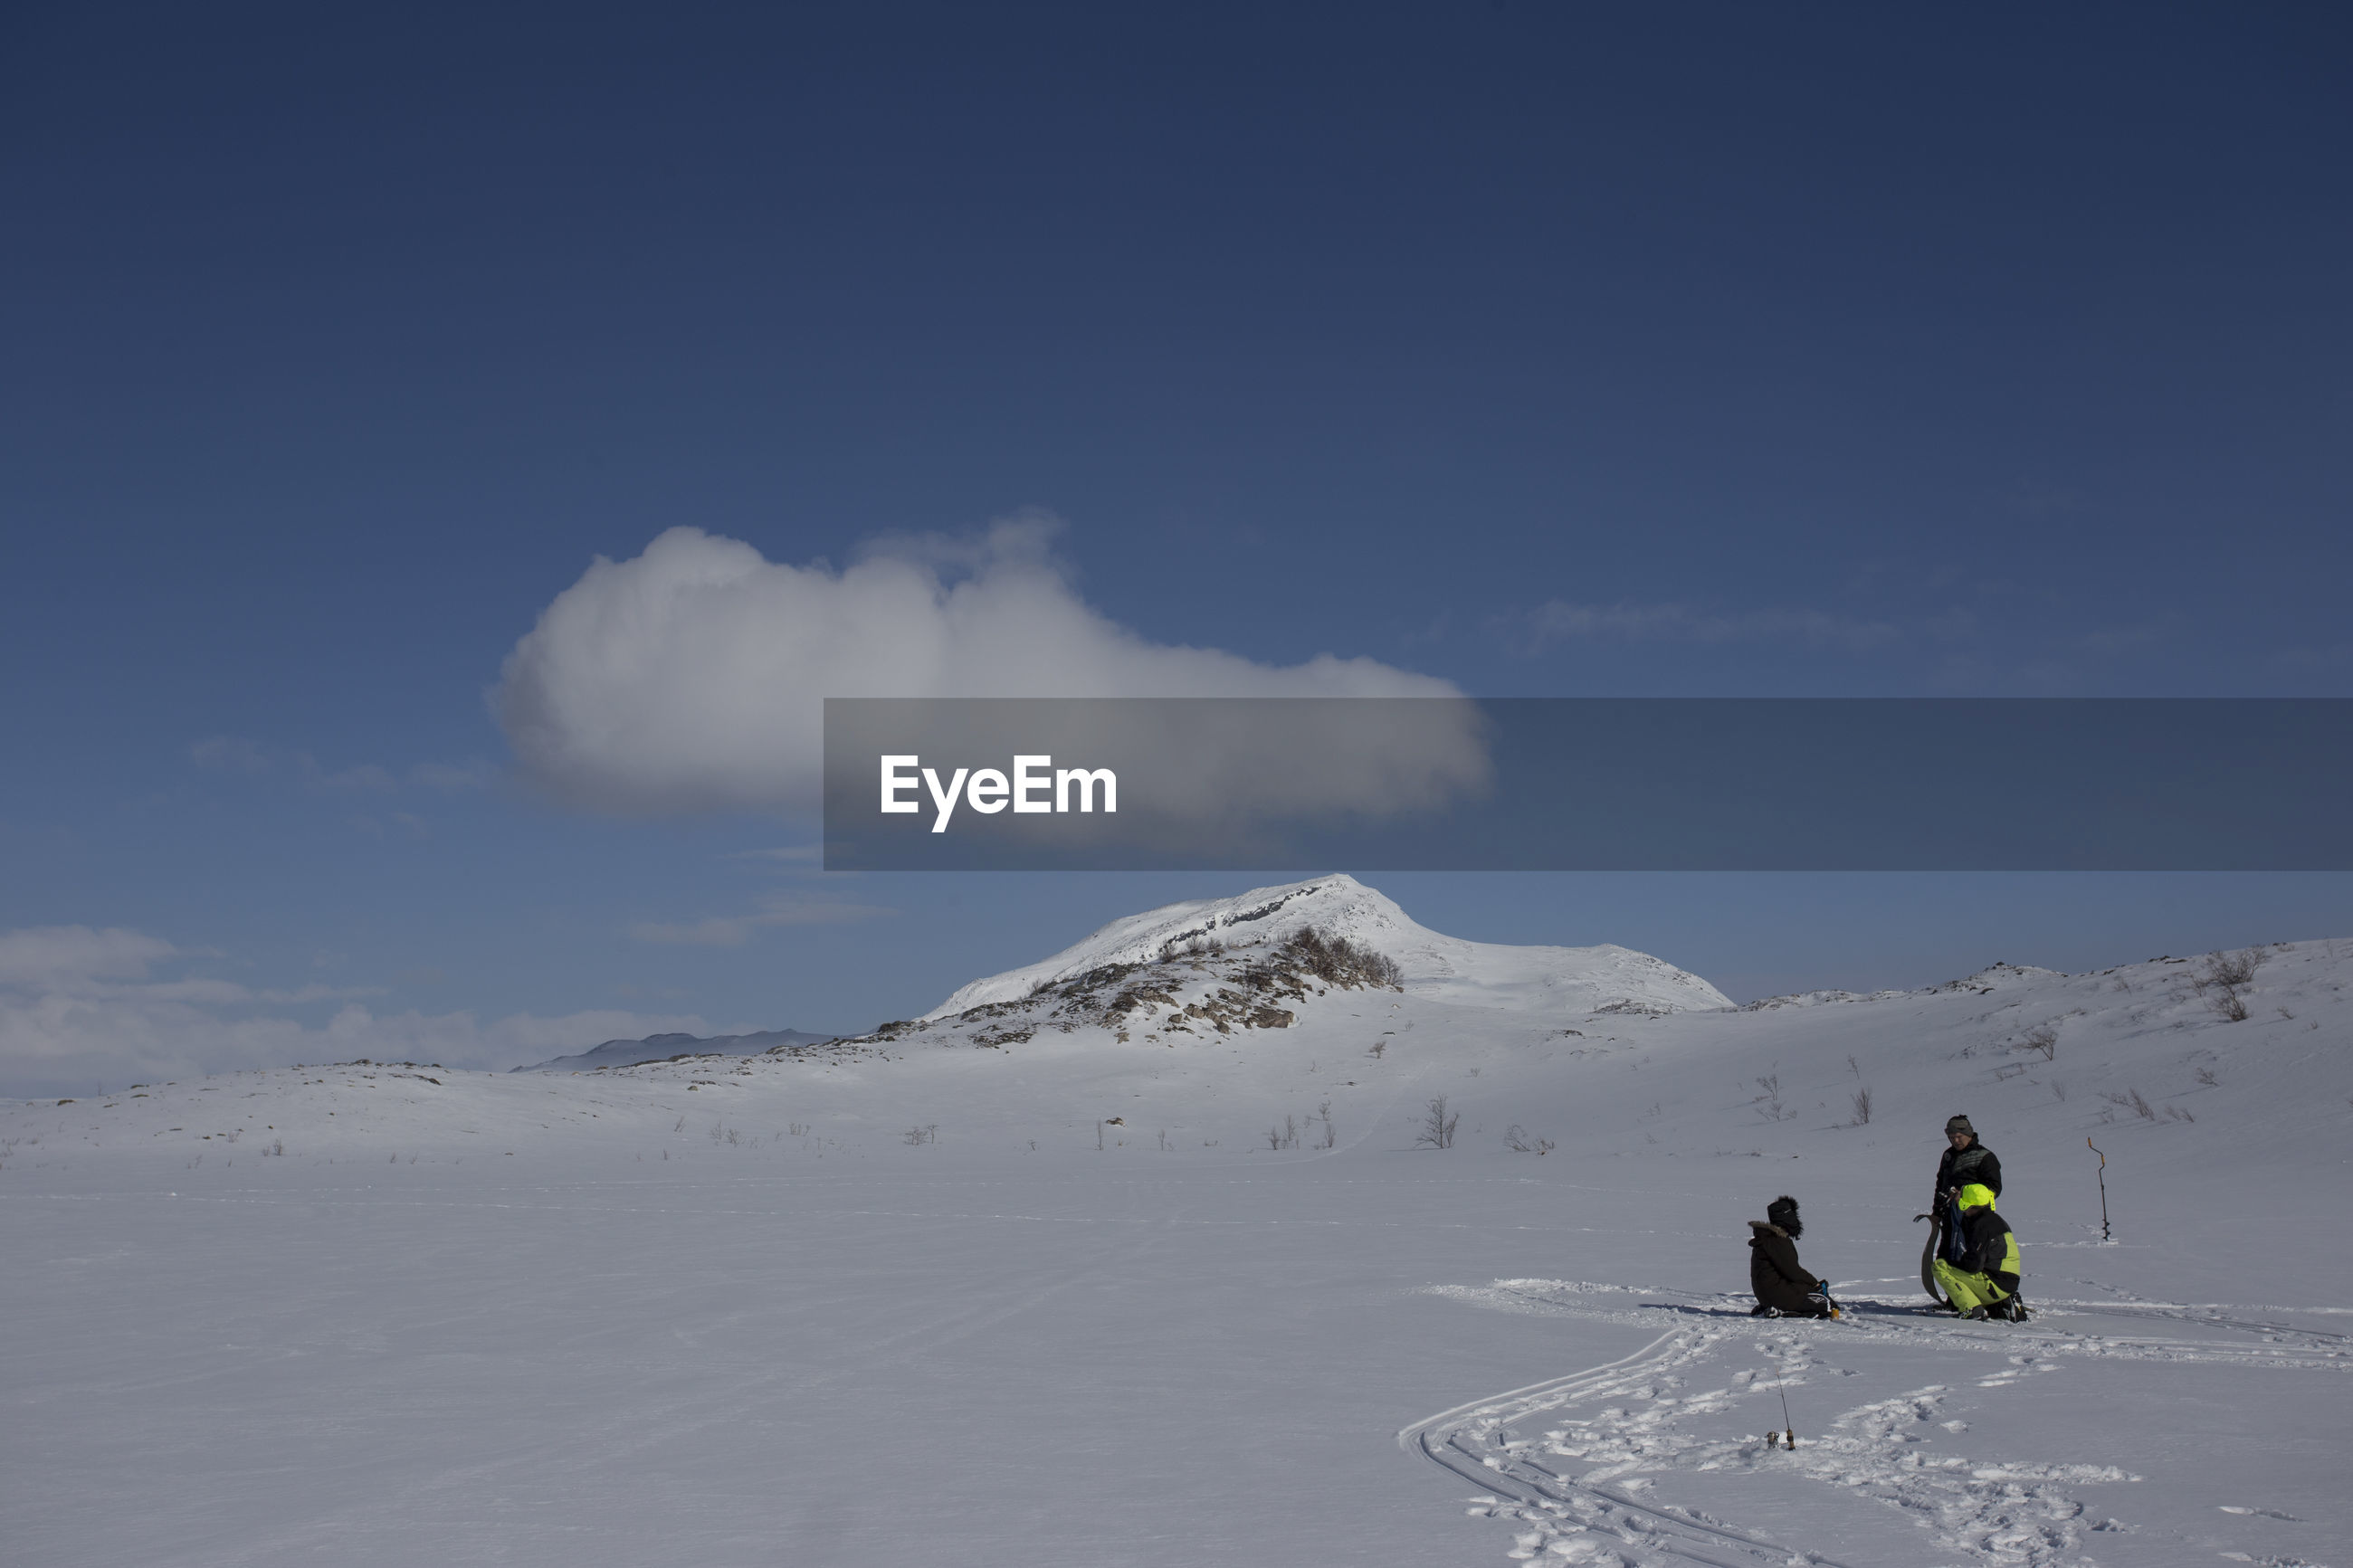 MAN SKIING ON SNOWY MOUNTAIN AGAINST SKY